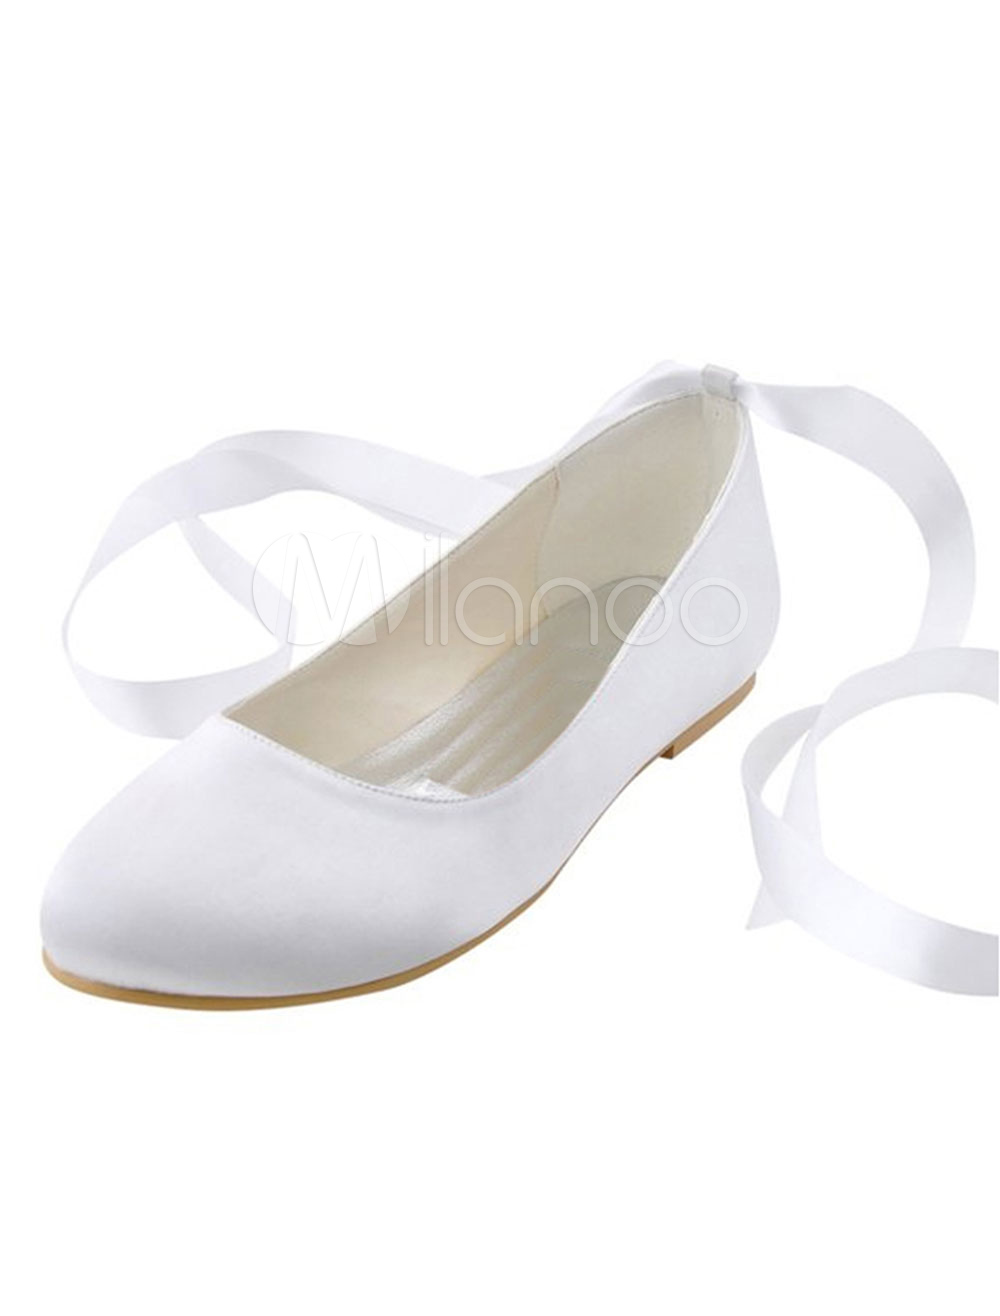 White Wedding Shoes Silk Round Toe Ribbons Lace Up Slip On Bridal Flat Pumps